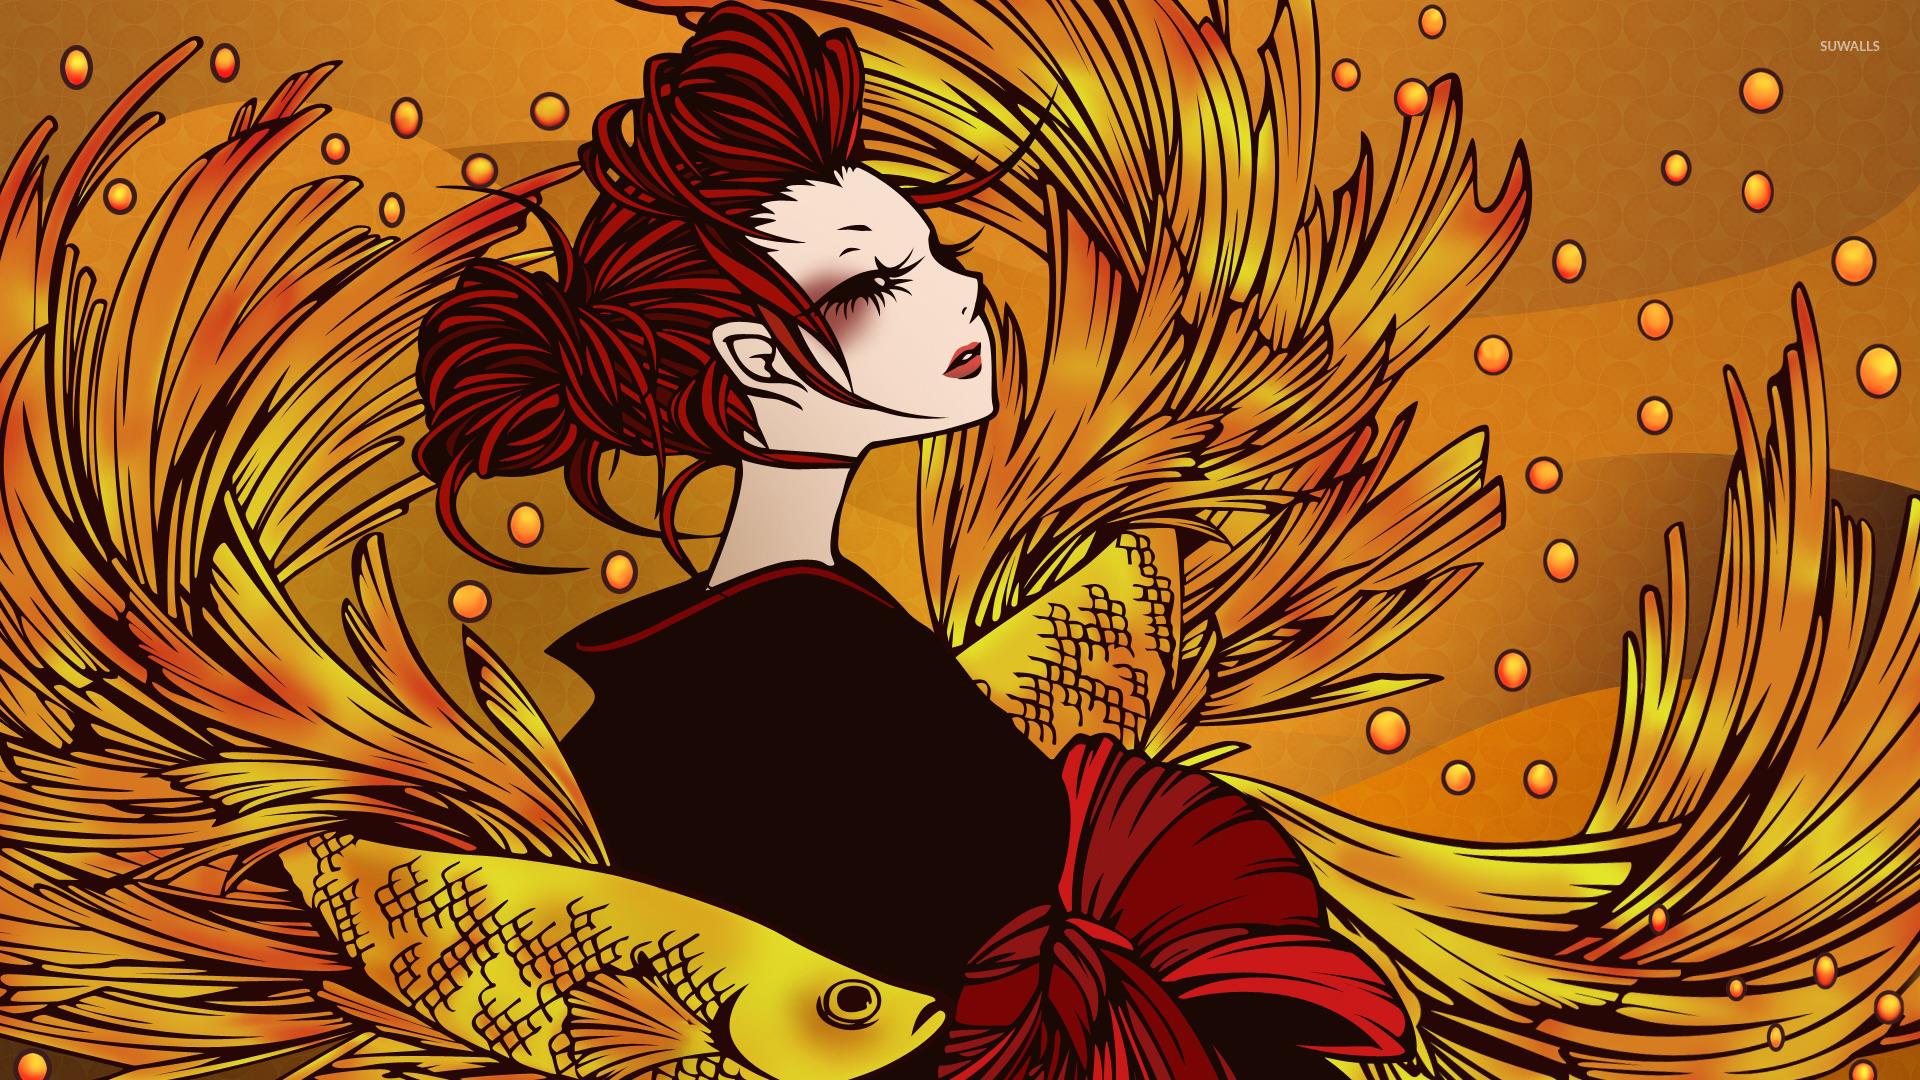 Redhead mermaid wallpaper - Anime wallpapers - #47595